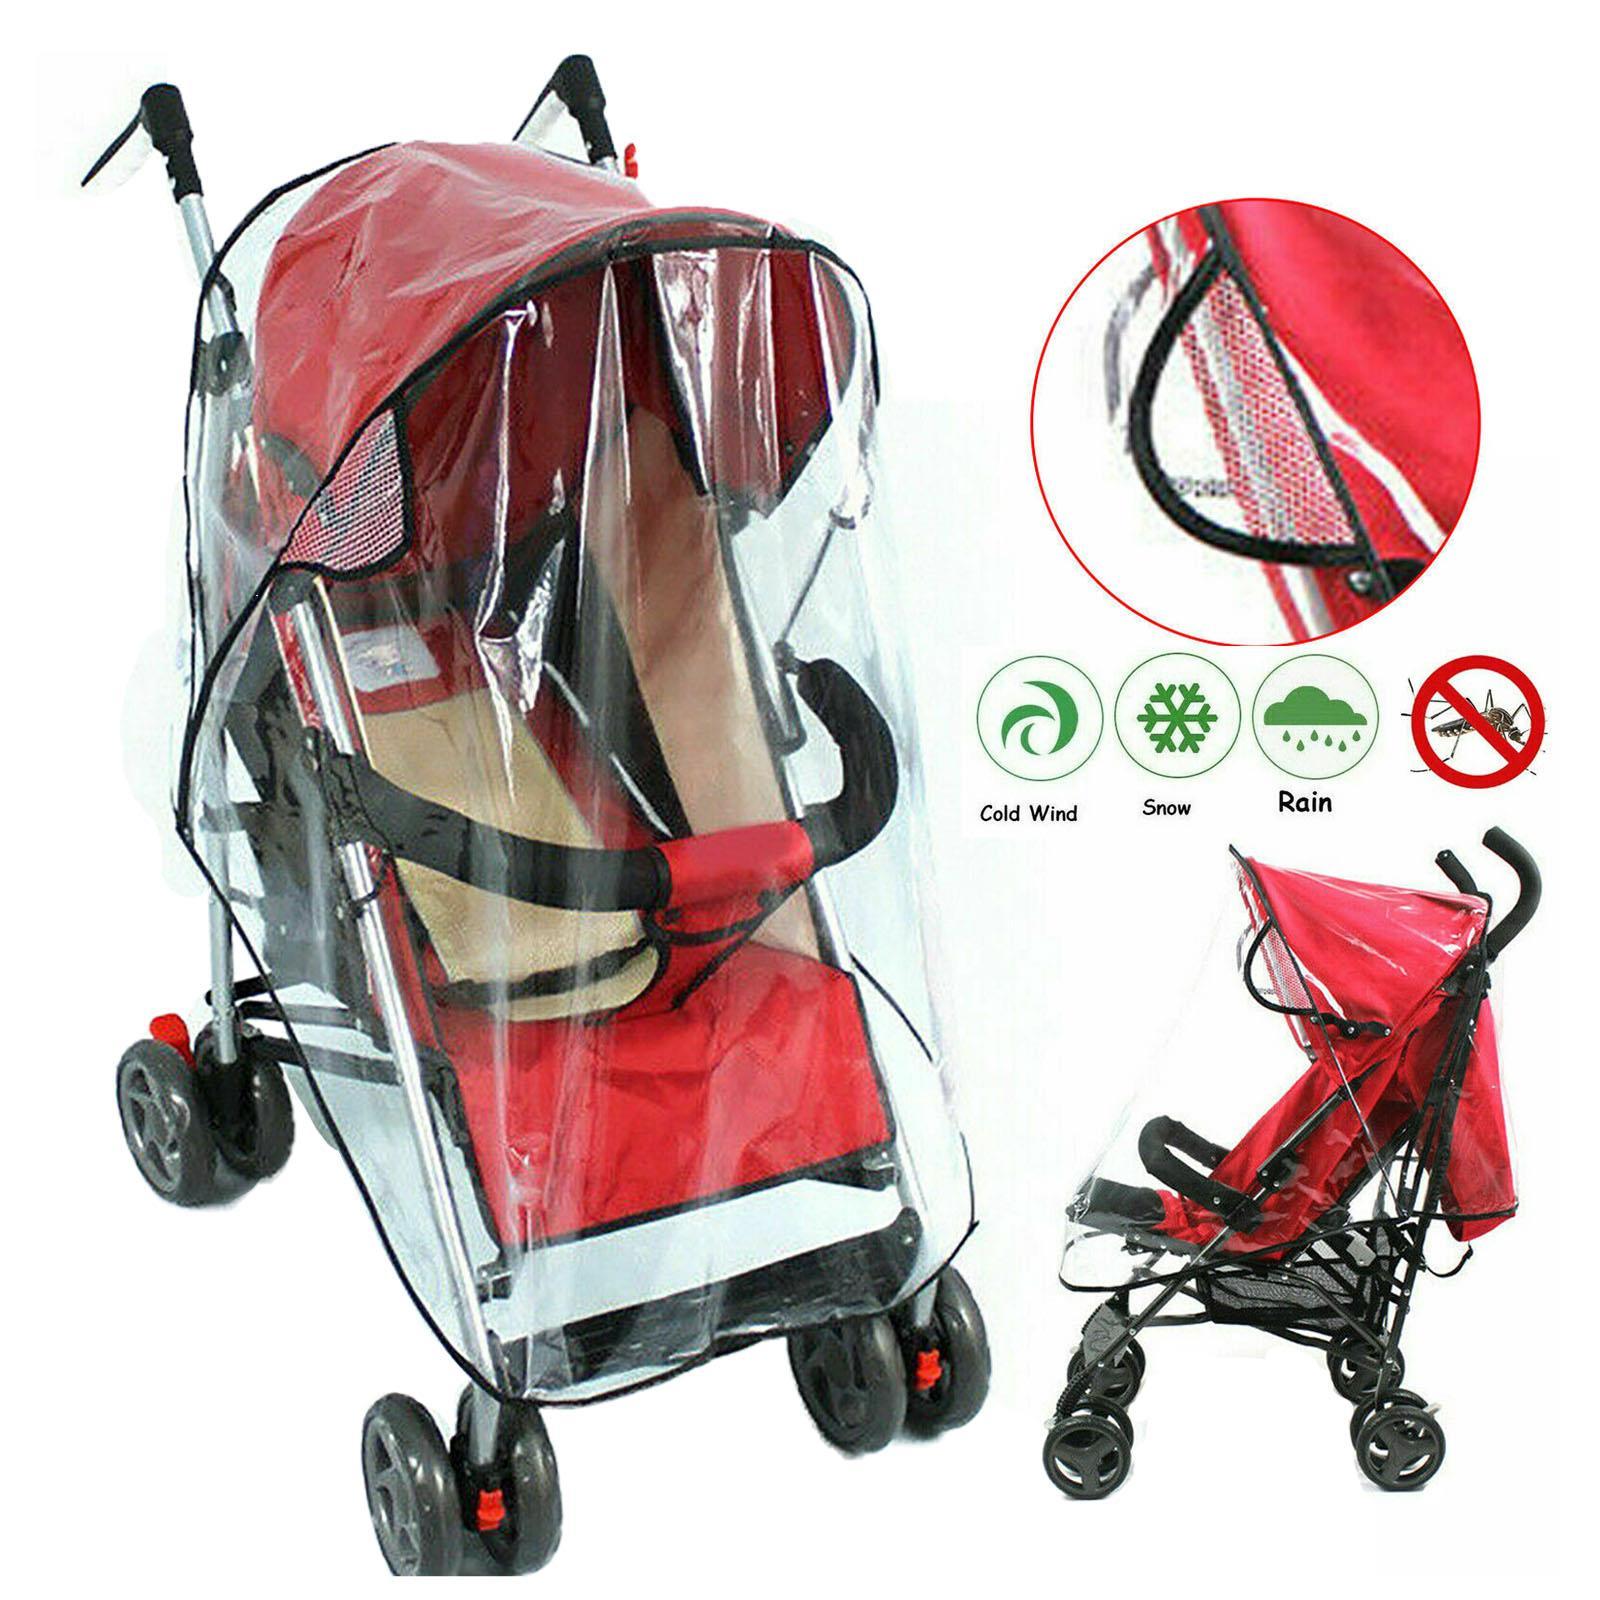 Universal Transparent Pushchair Stroller Rain Cover with Black Trim New